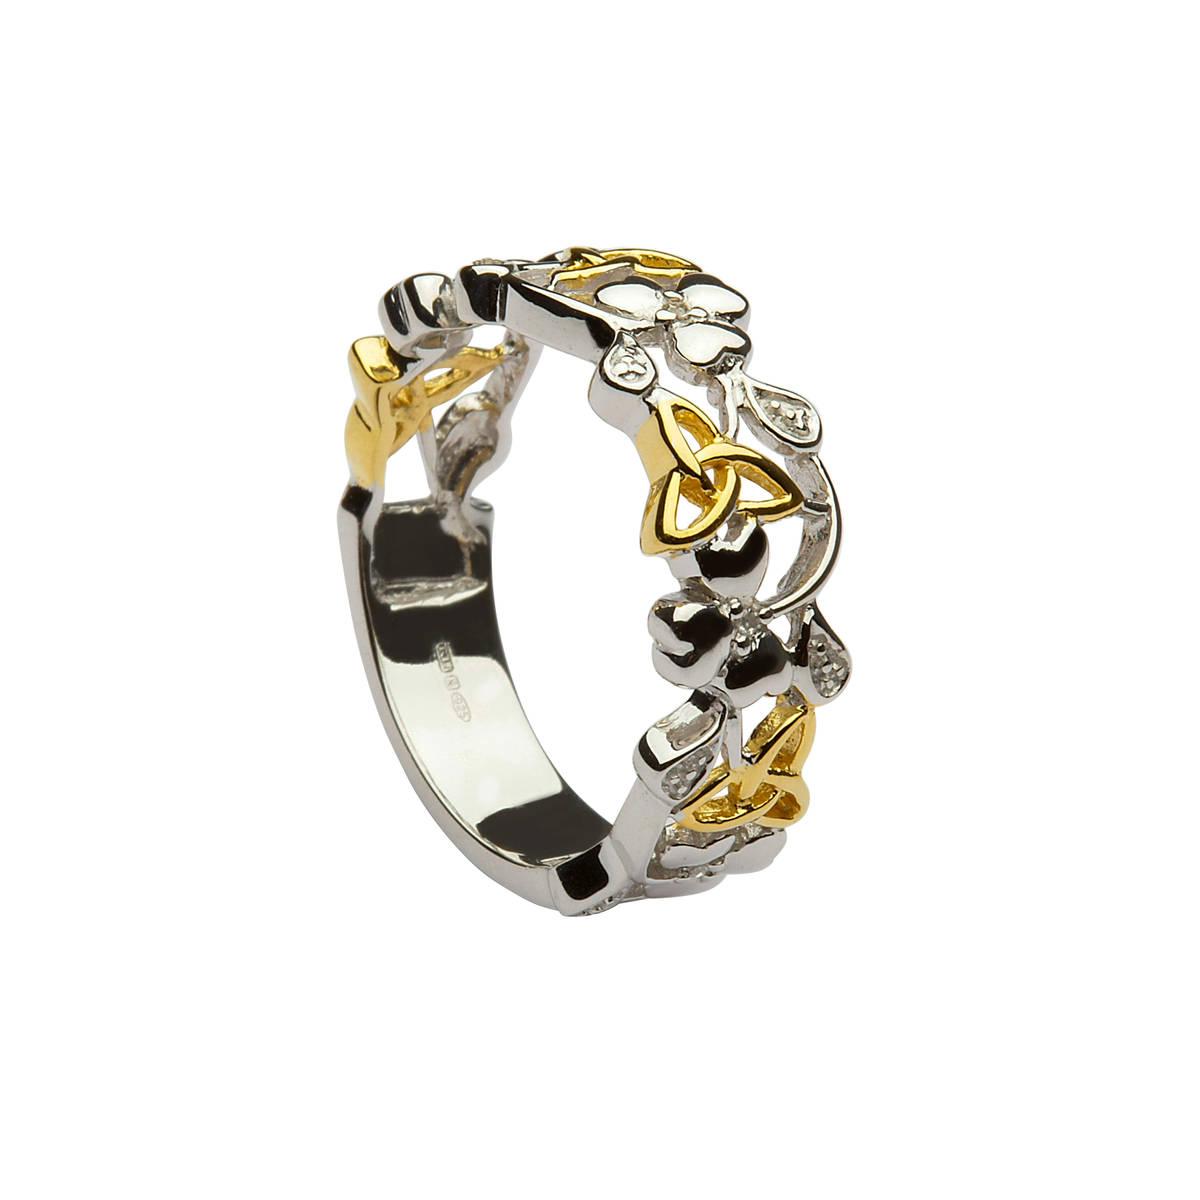 Silver/GP band shamrock/trinity knot and diamond ring